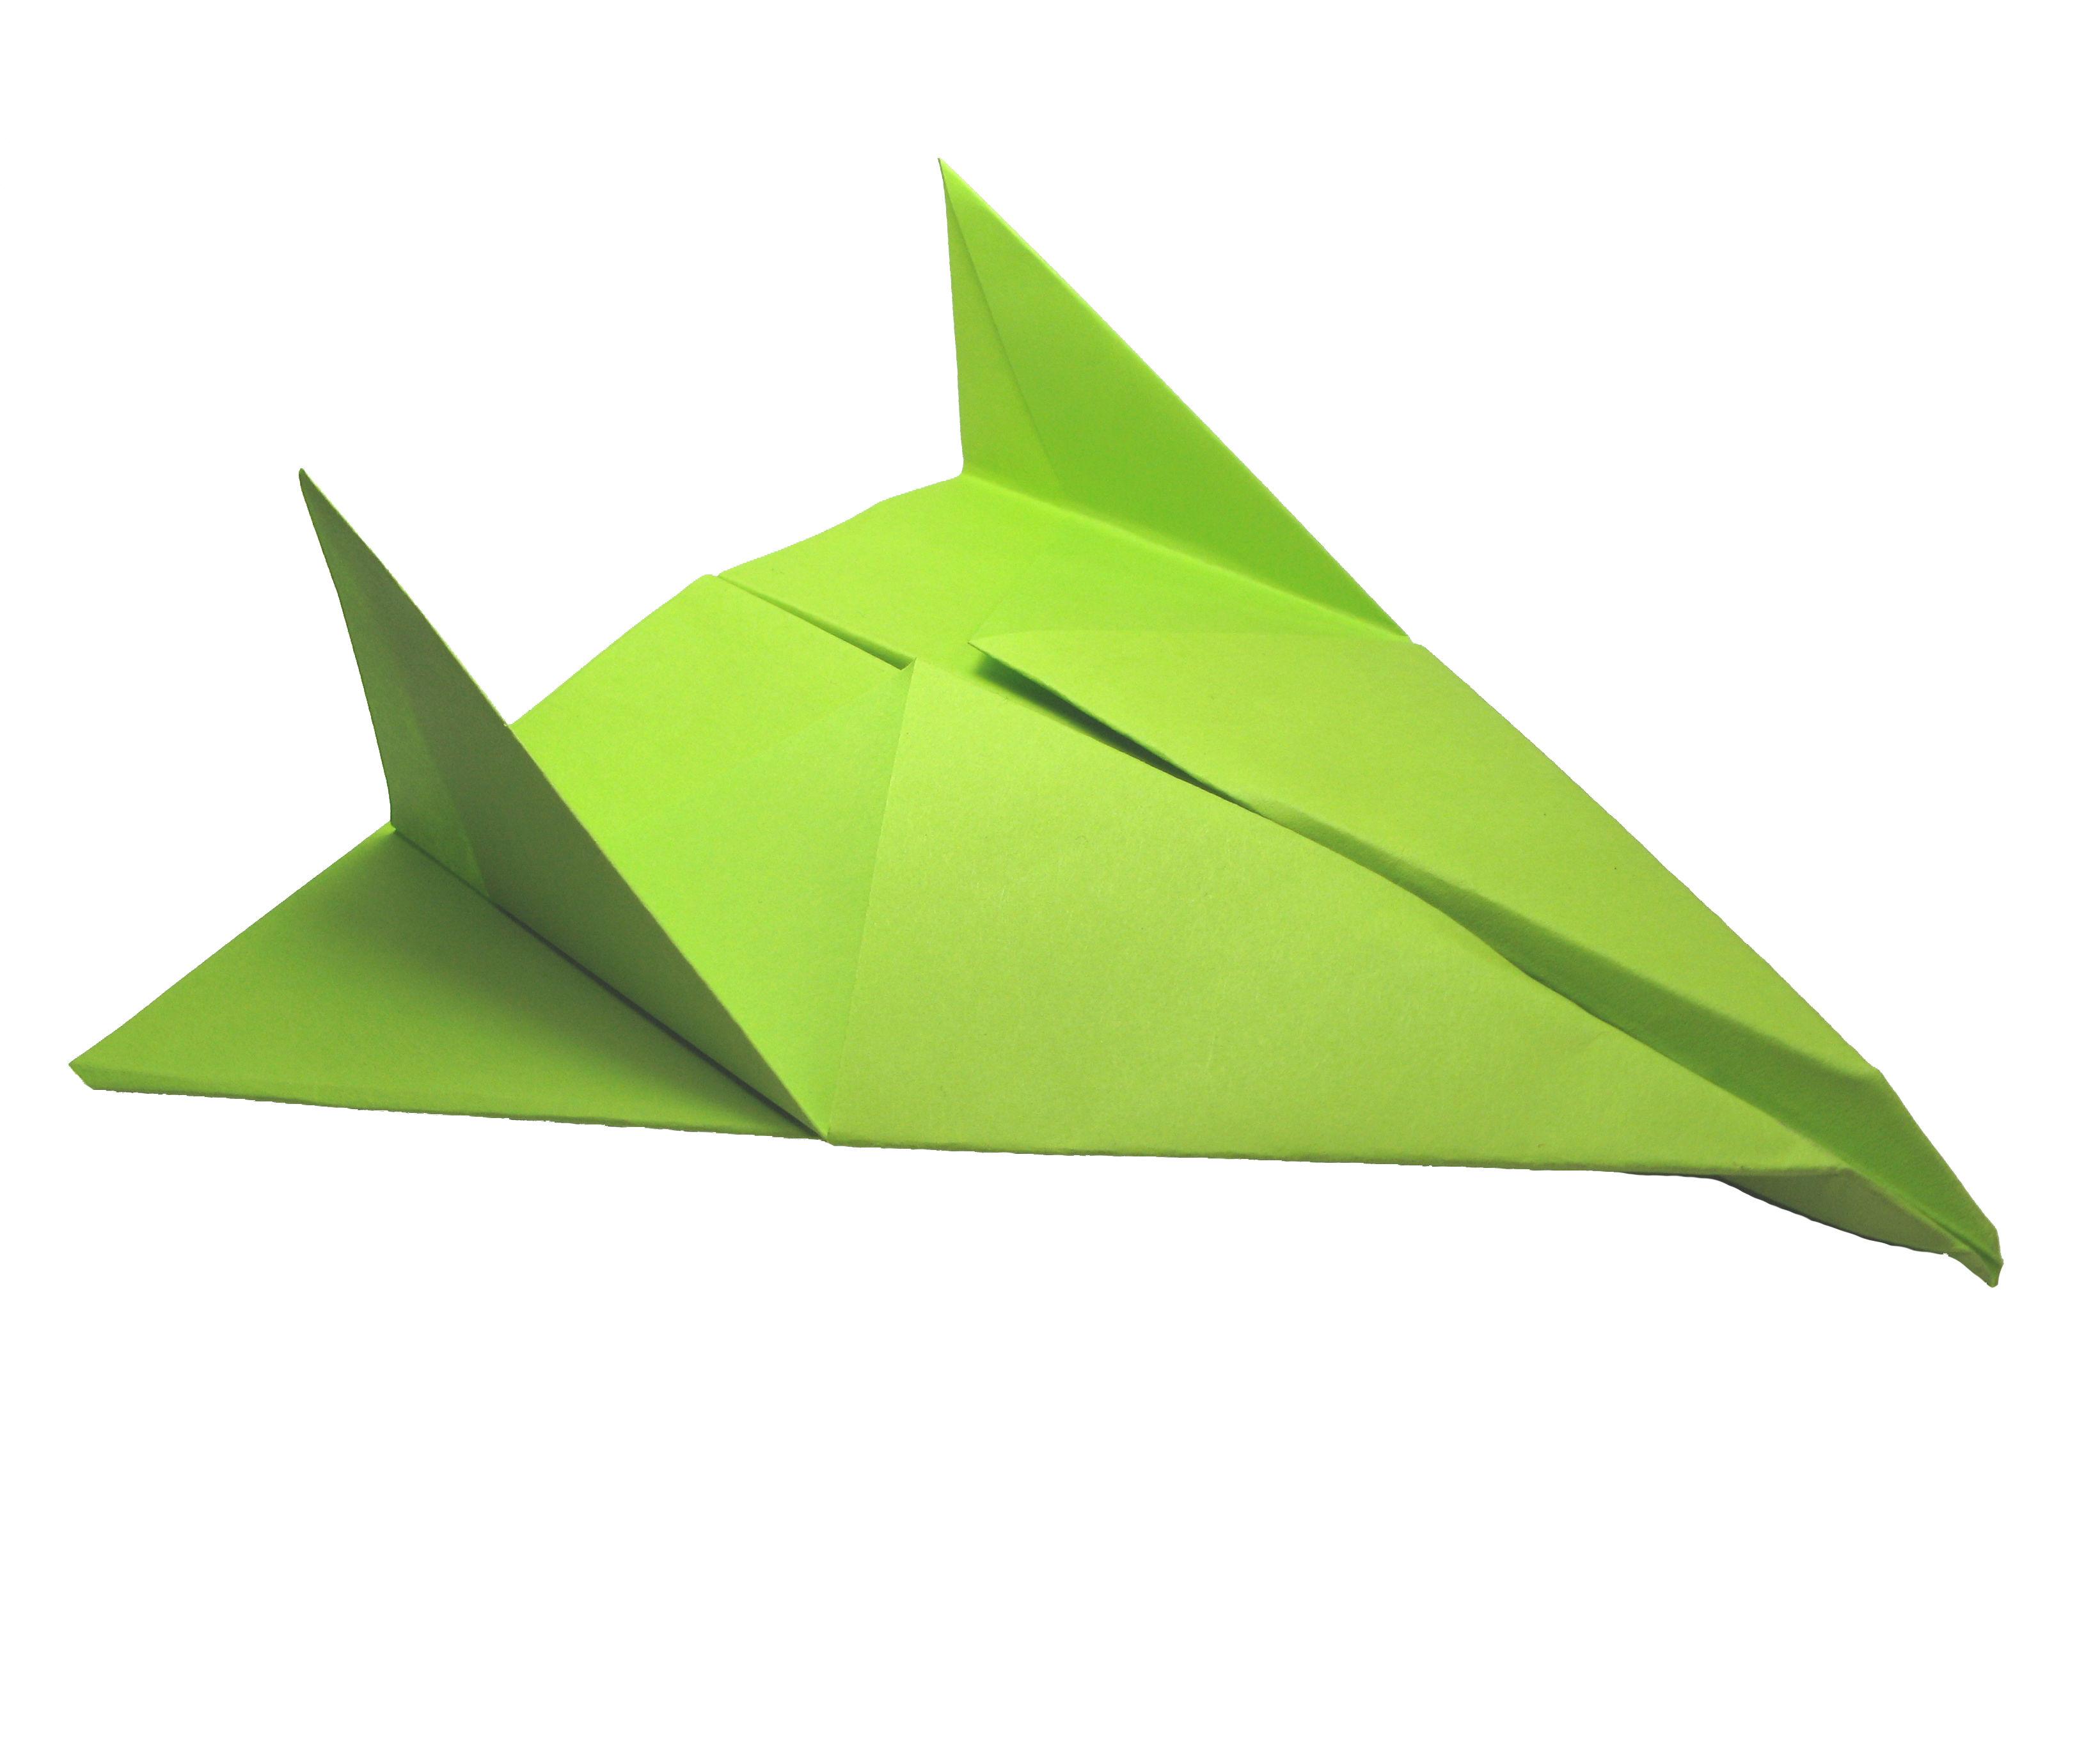 Origami Paper Airplane: Thunder Bomber